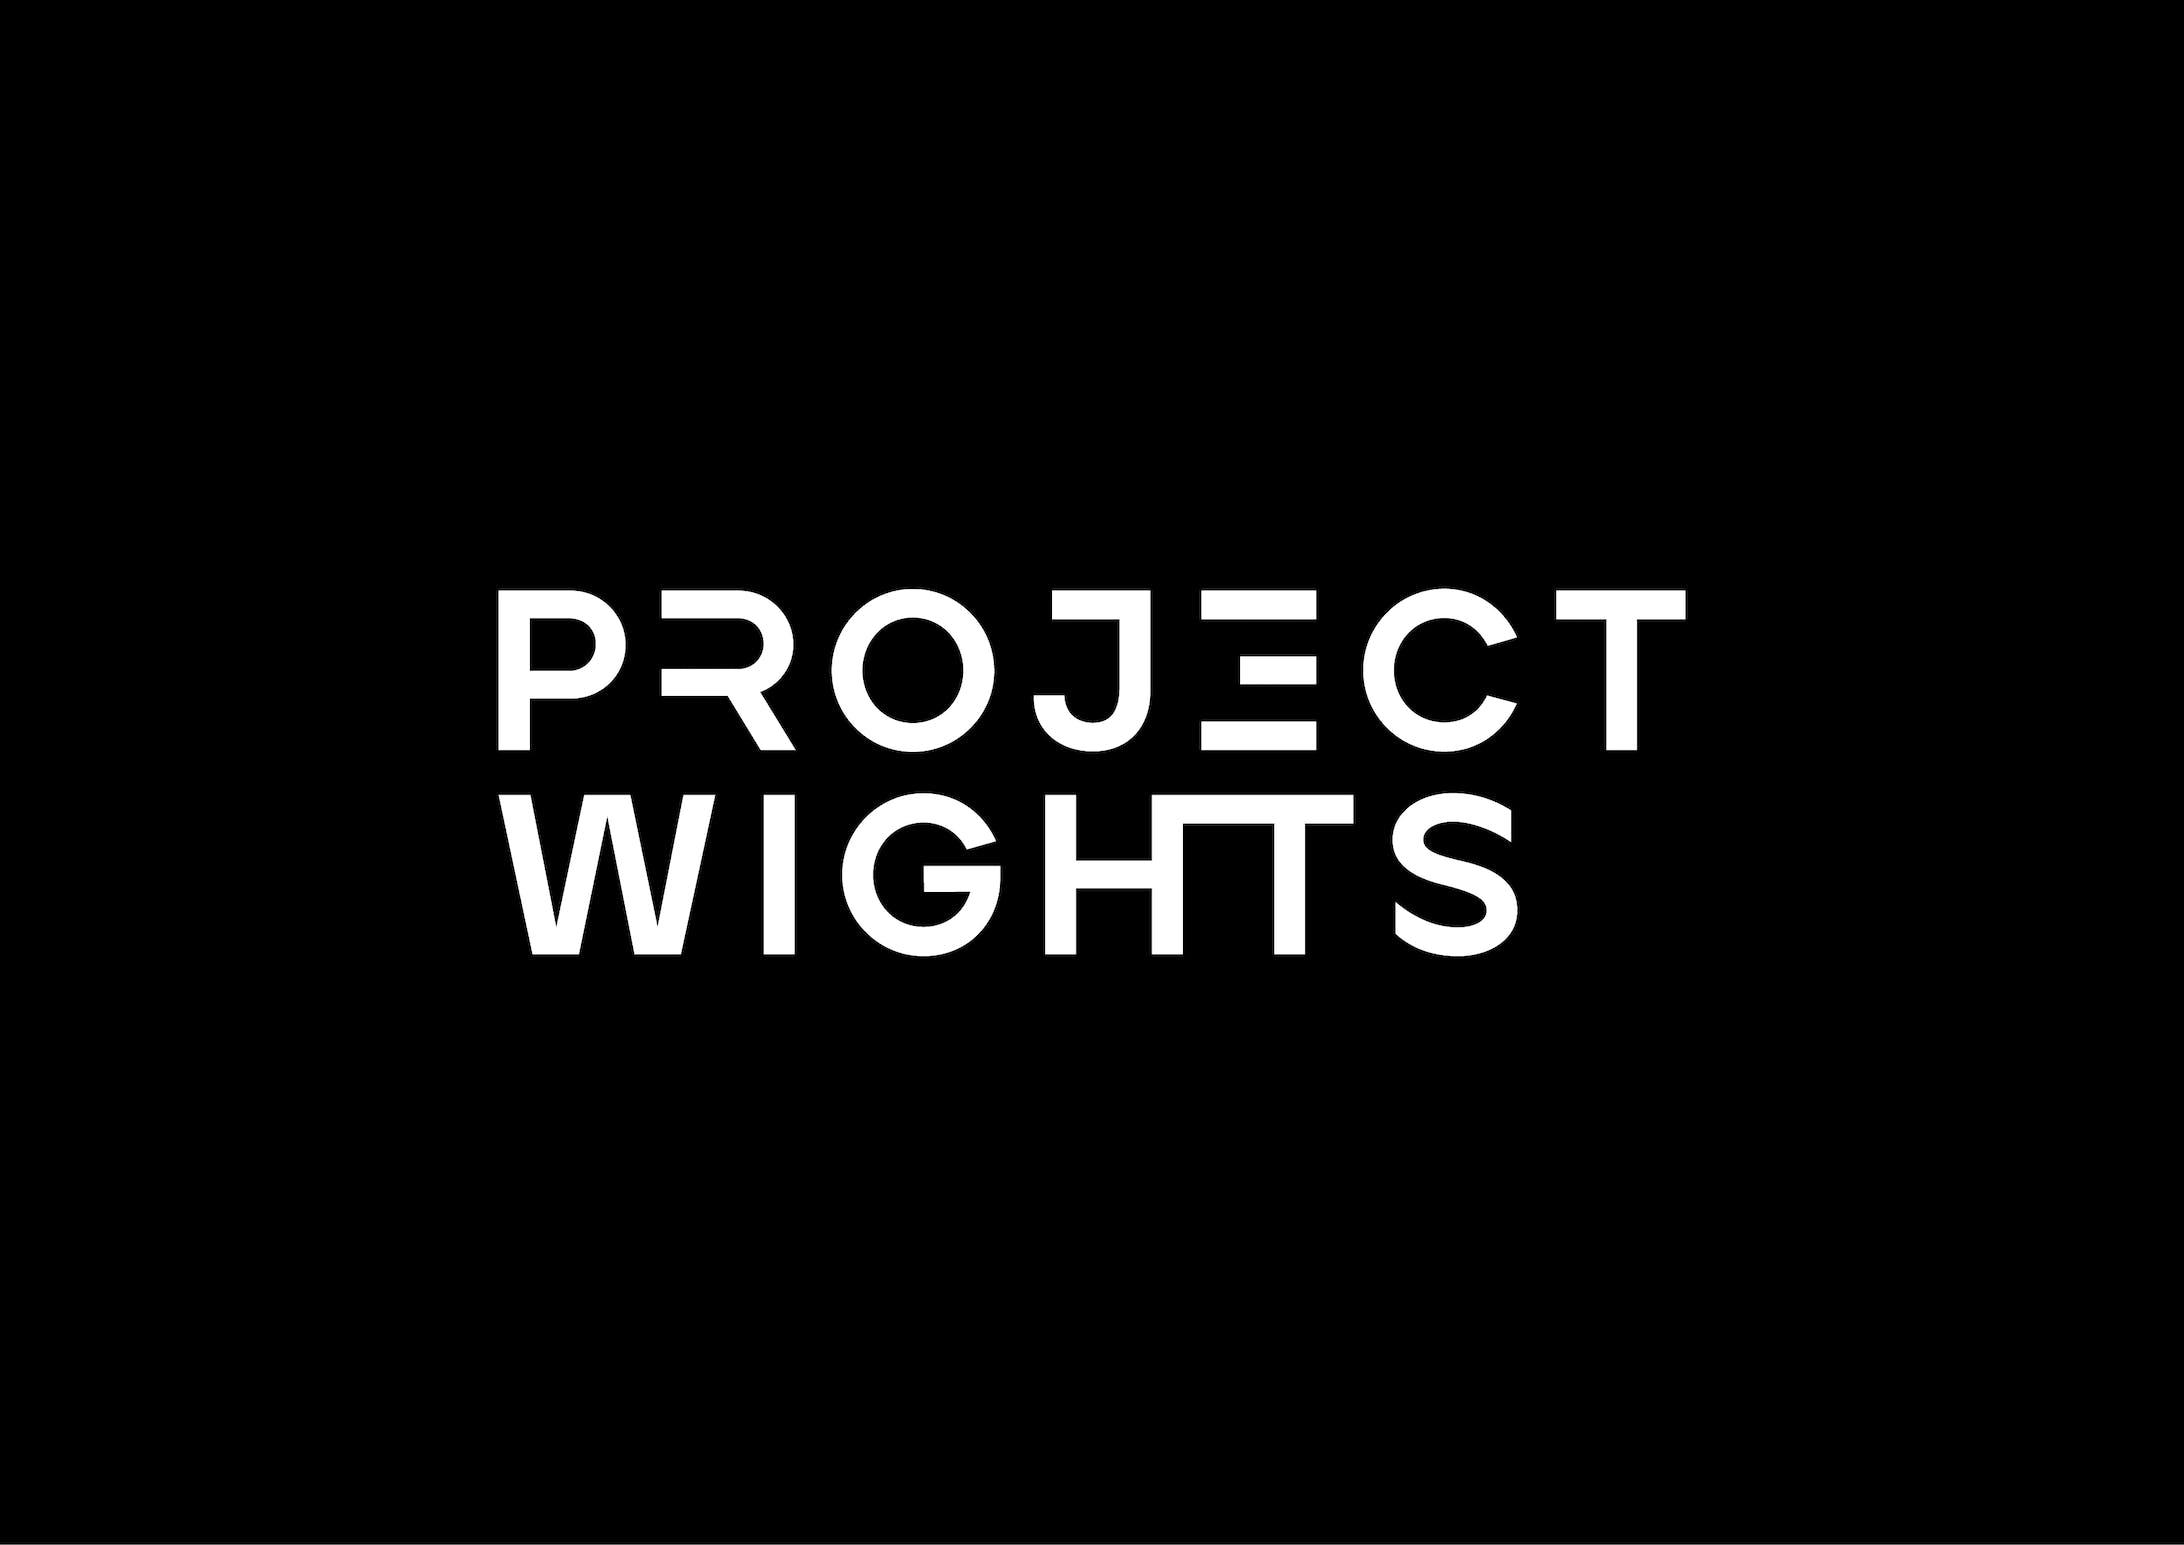 PROJECT WIGHTS - プロジェクトワイツ-6